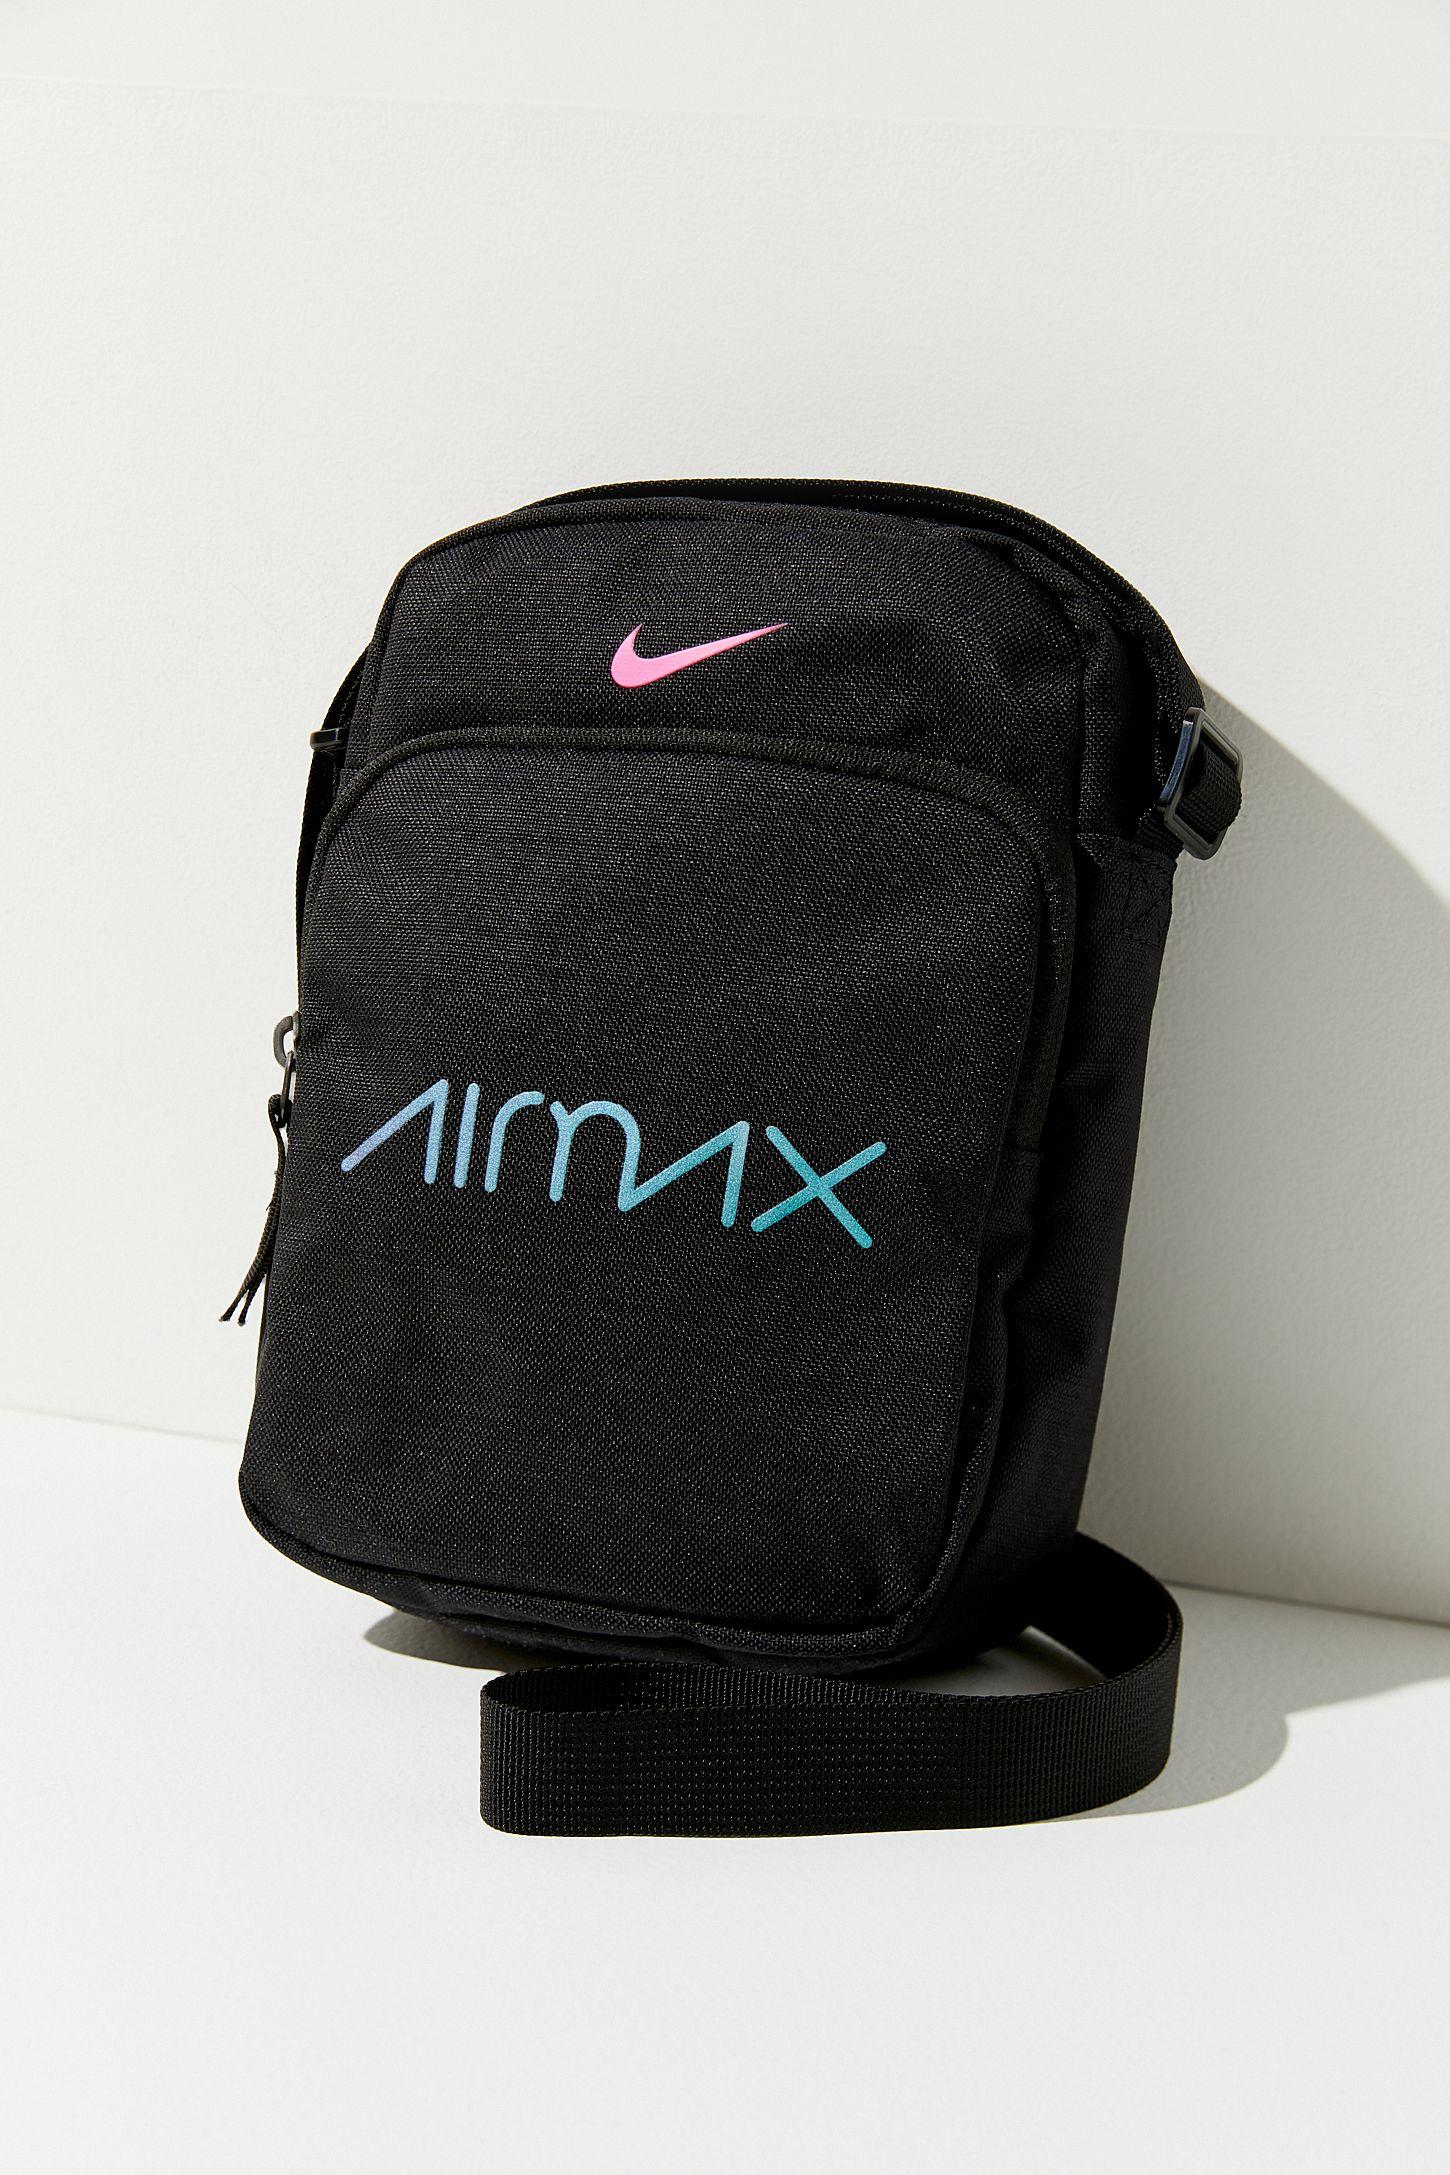 9caaf11ca904 Slide View  6  Nike SB Heritage Air Max Crossbody Bag